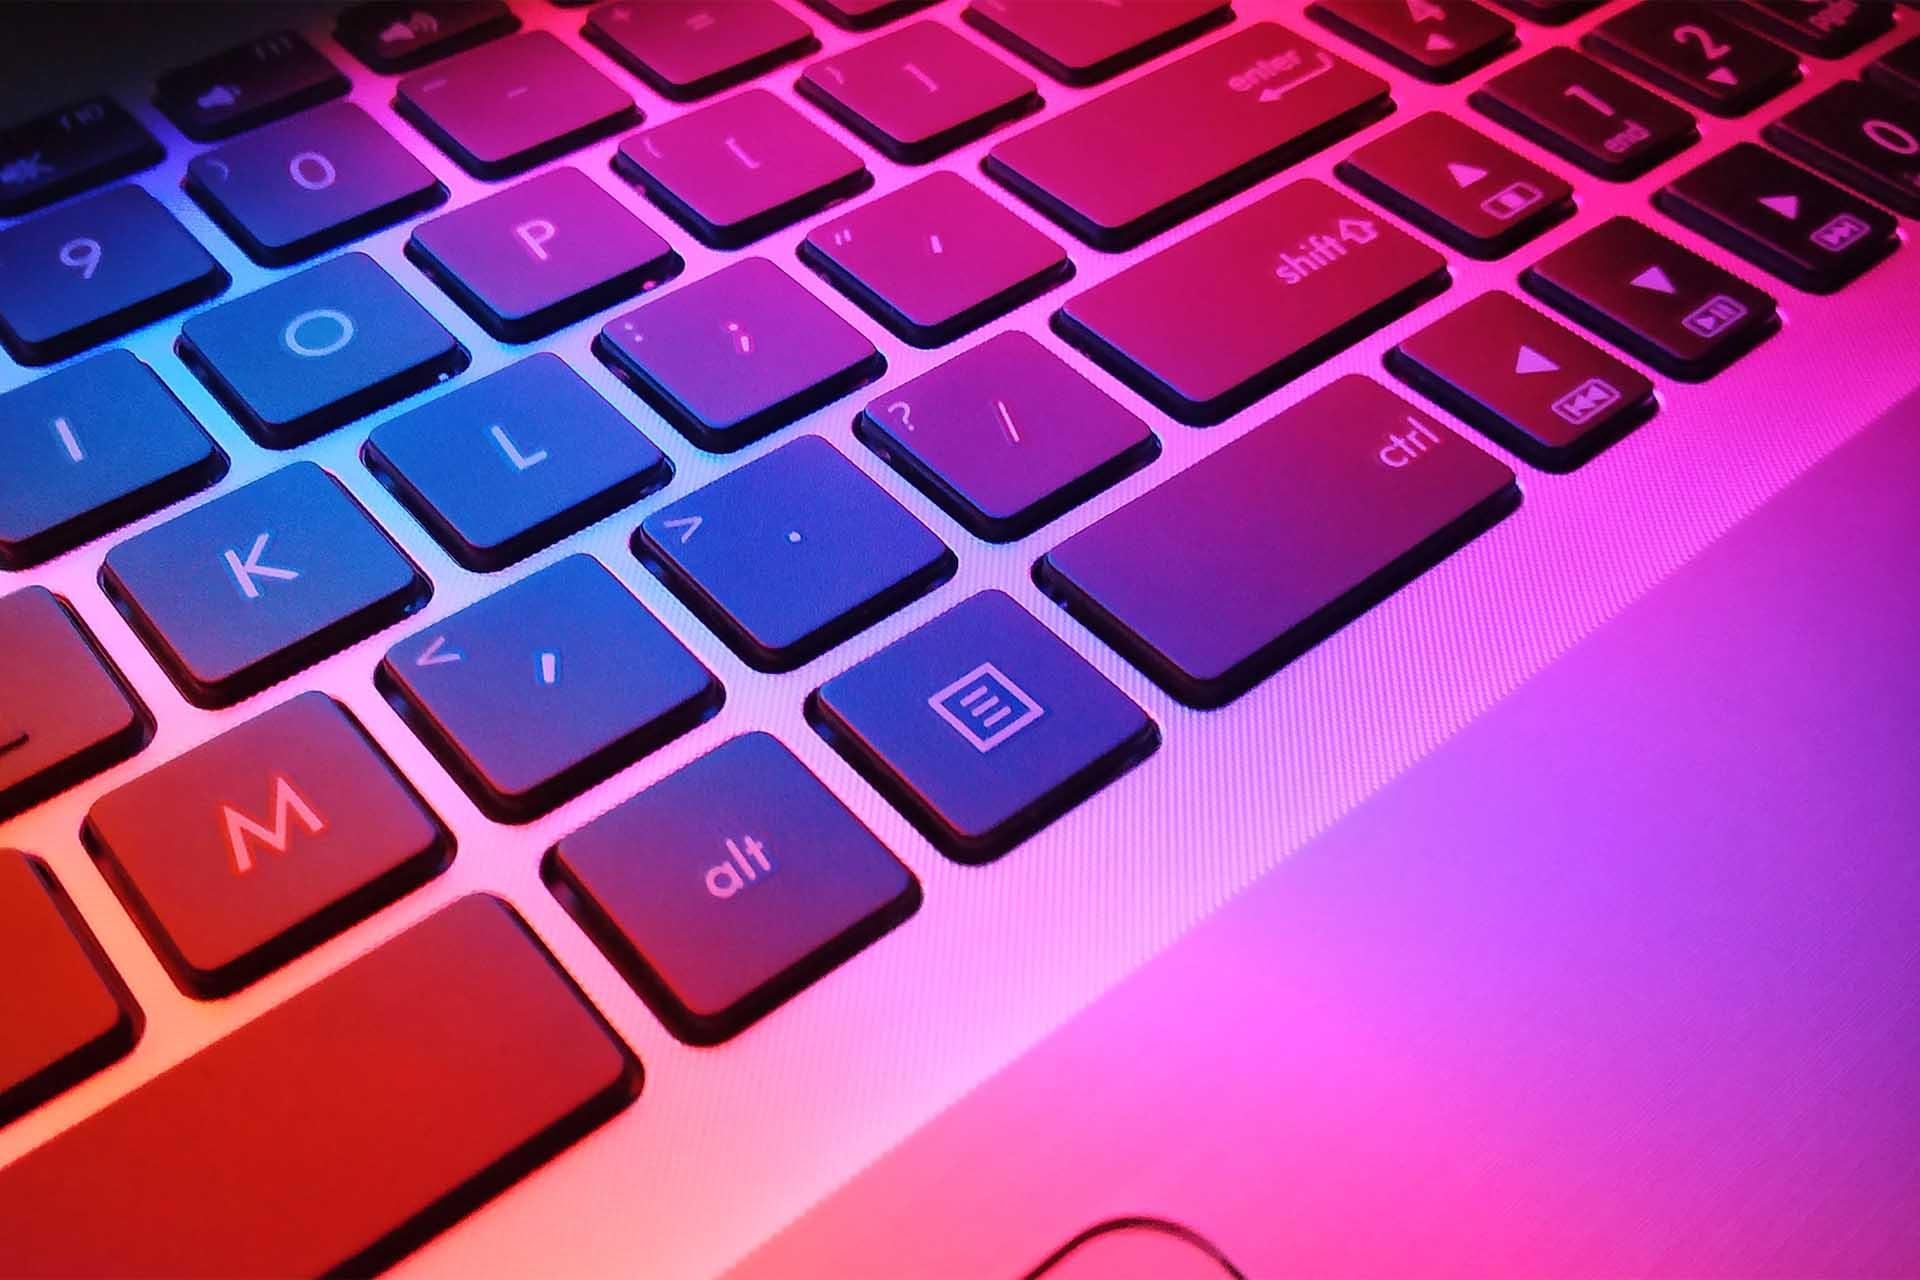 t2informatik Blog: Softwareauswahl in 10 Schritten